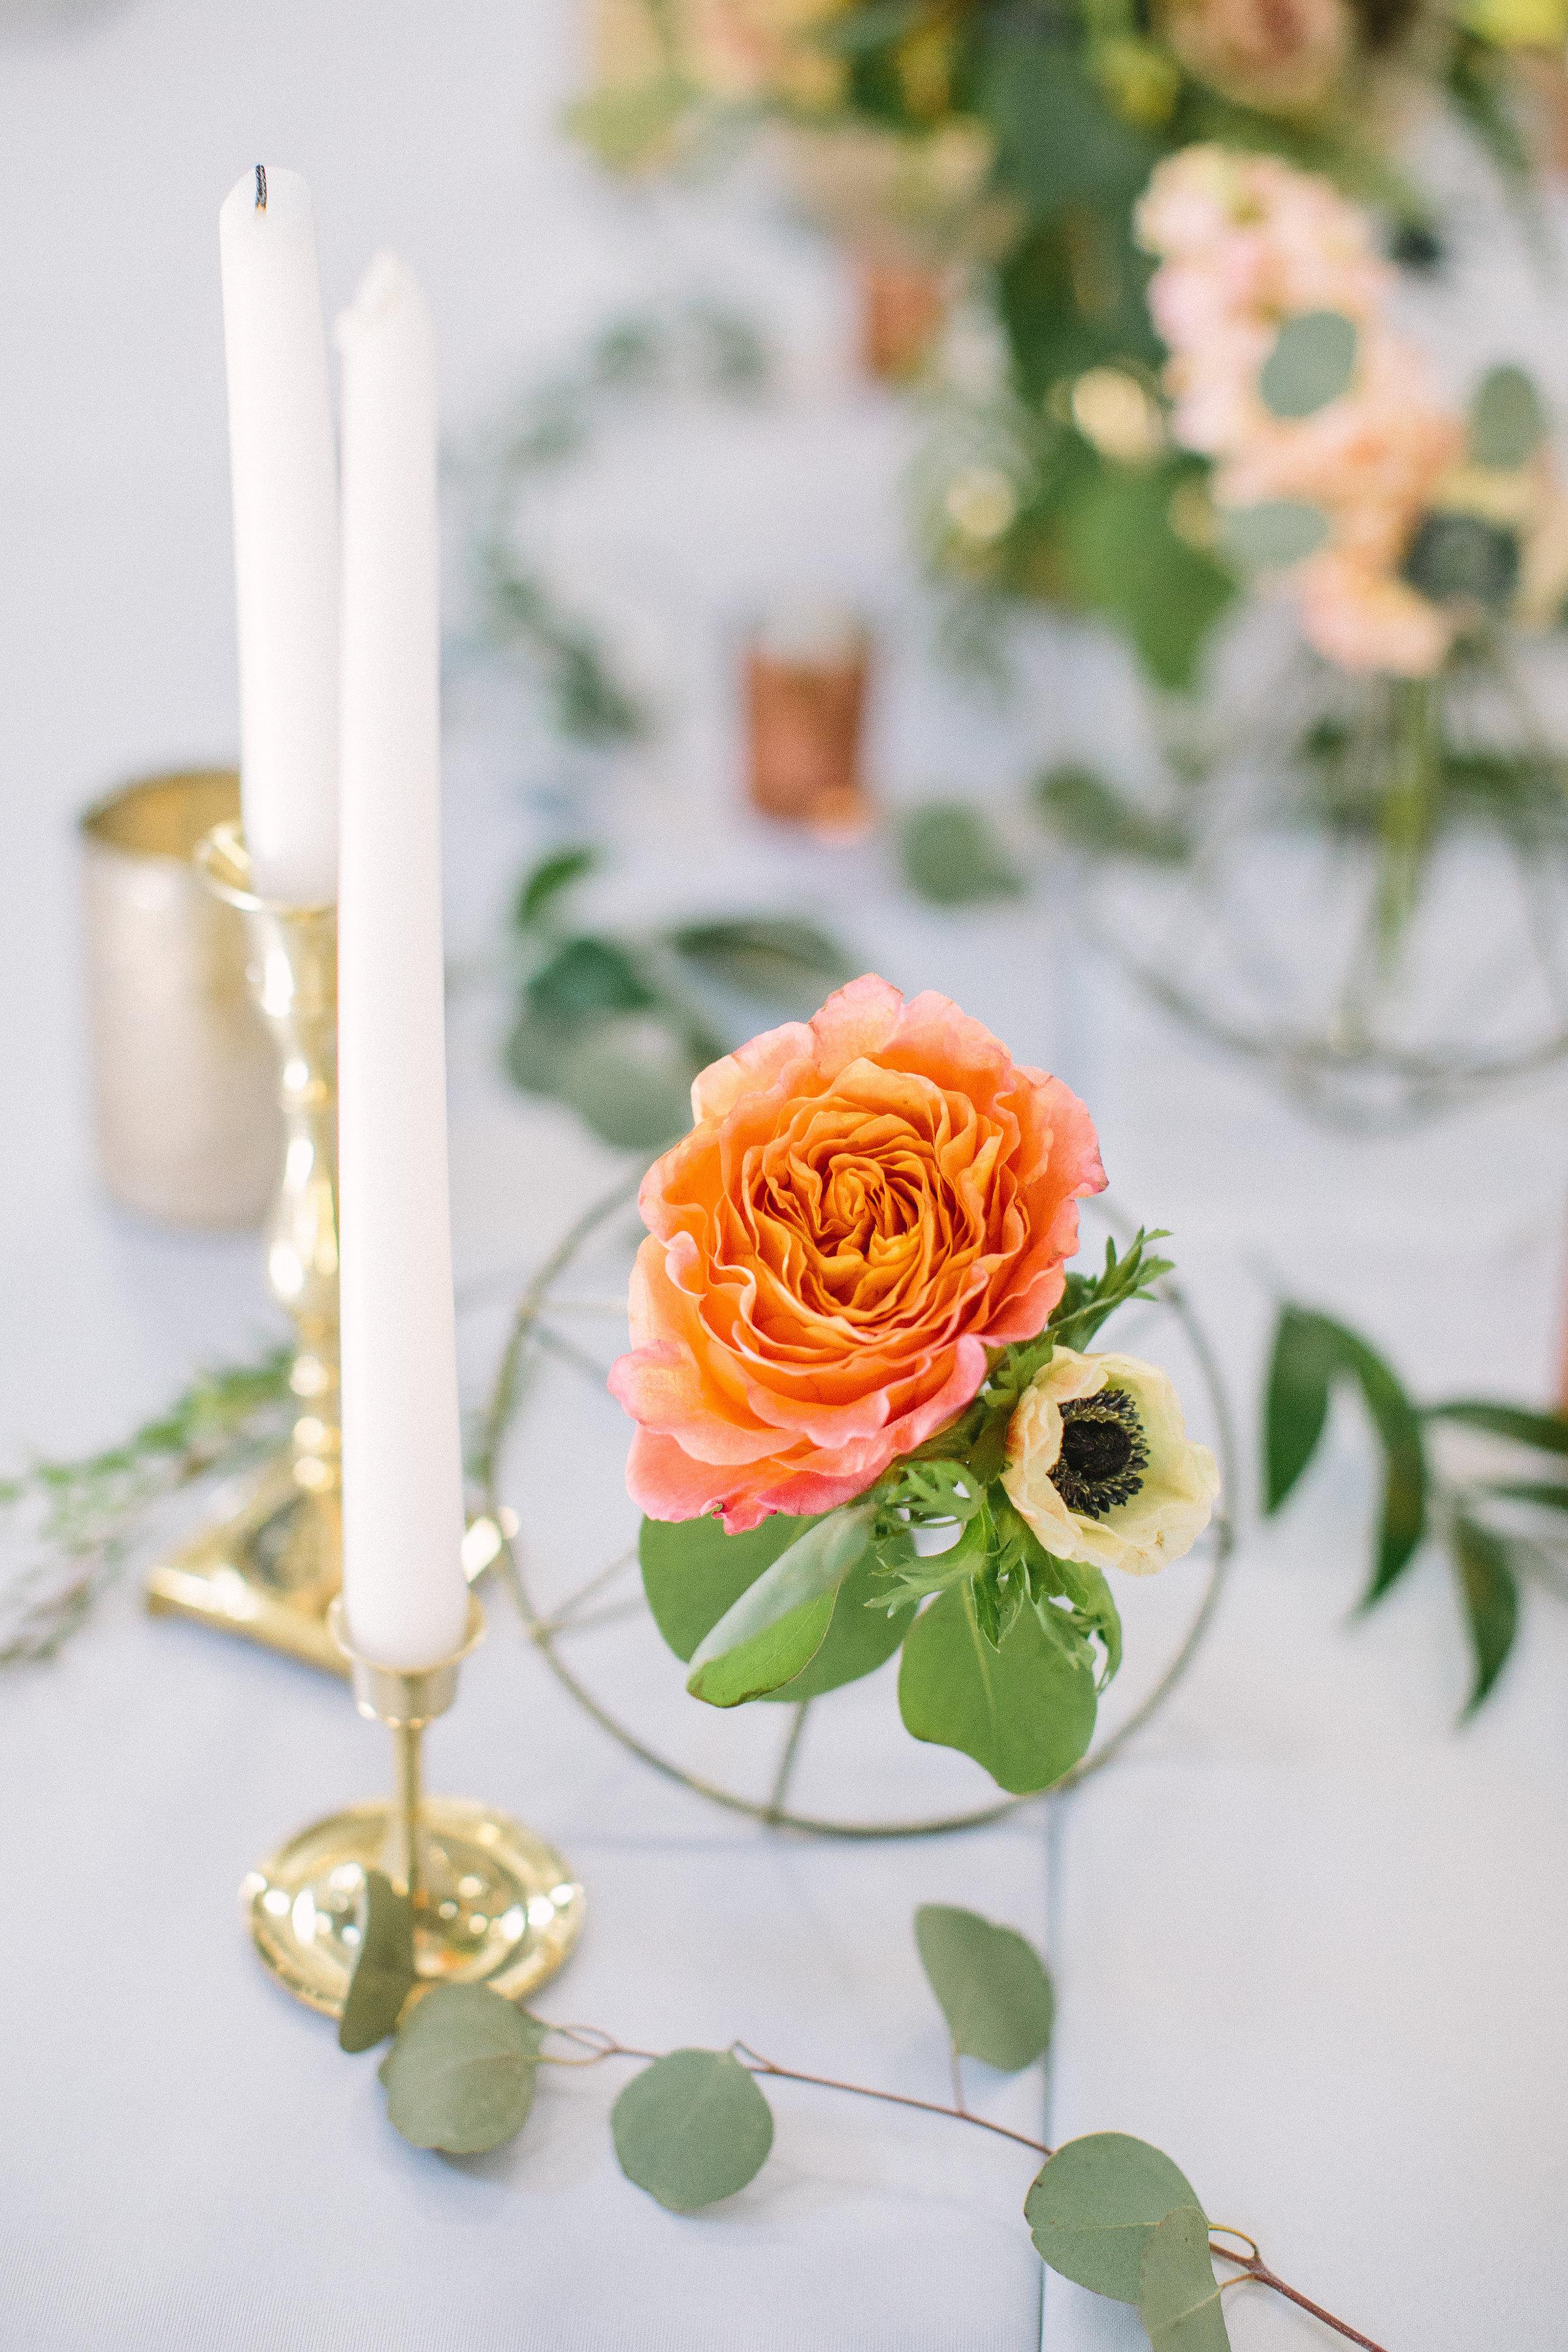 Ellen-Ashton-Photography-Peach-Creek-Ranch-Weddings-Wed-and-Prosper79